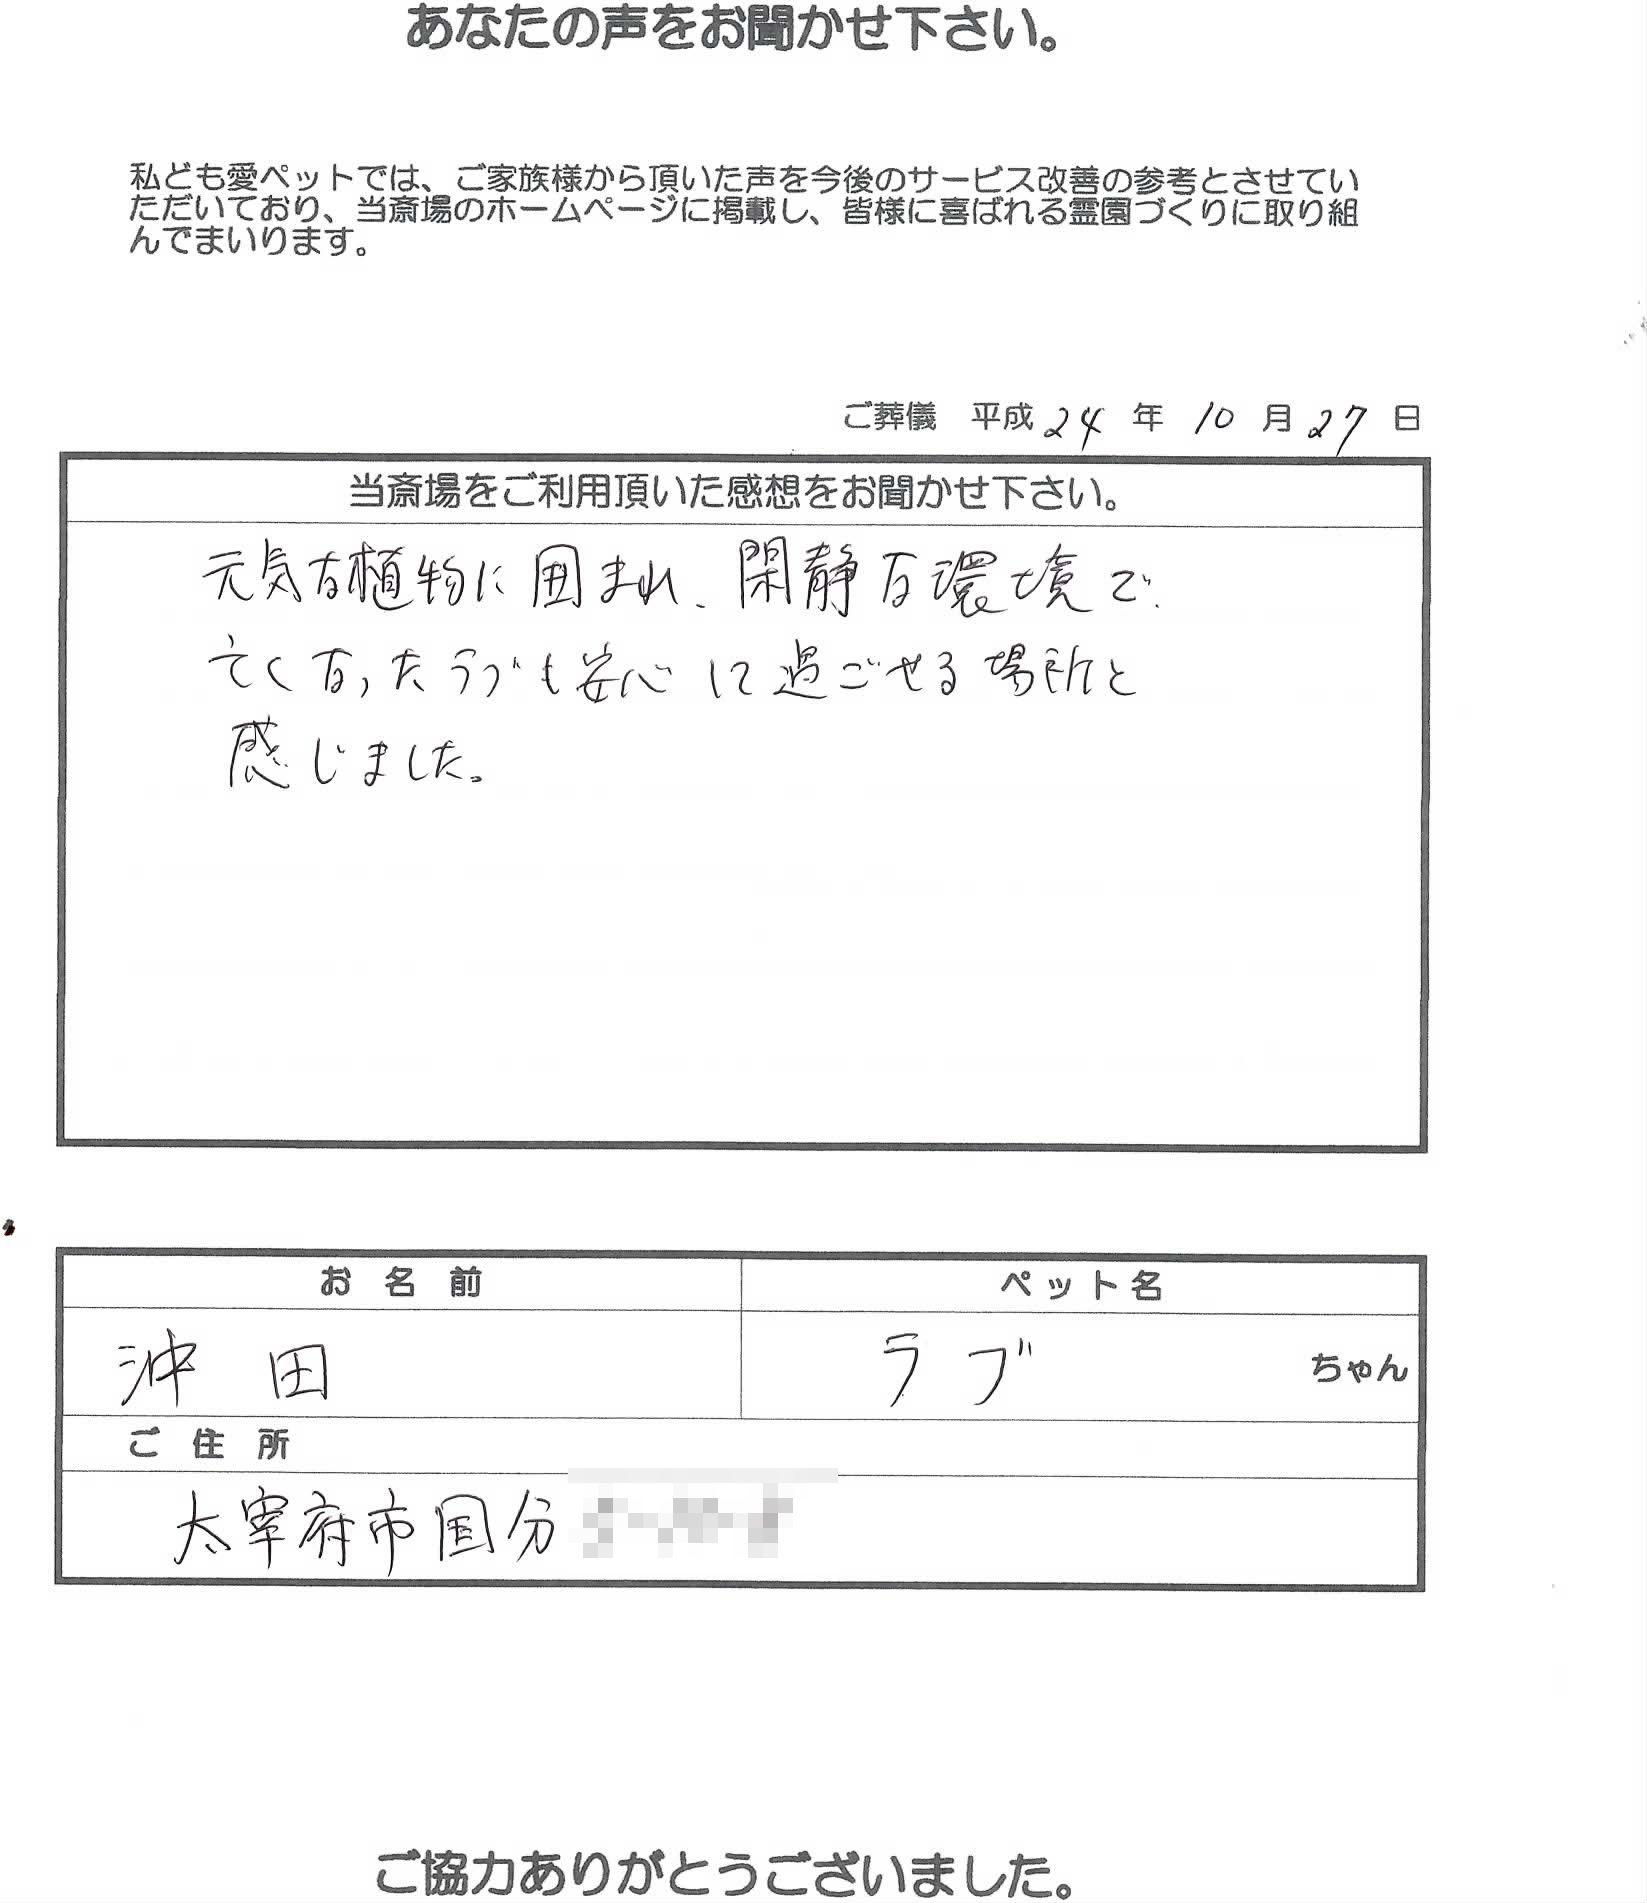 k121027-1.jpg